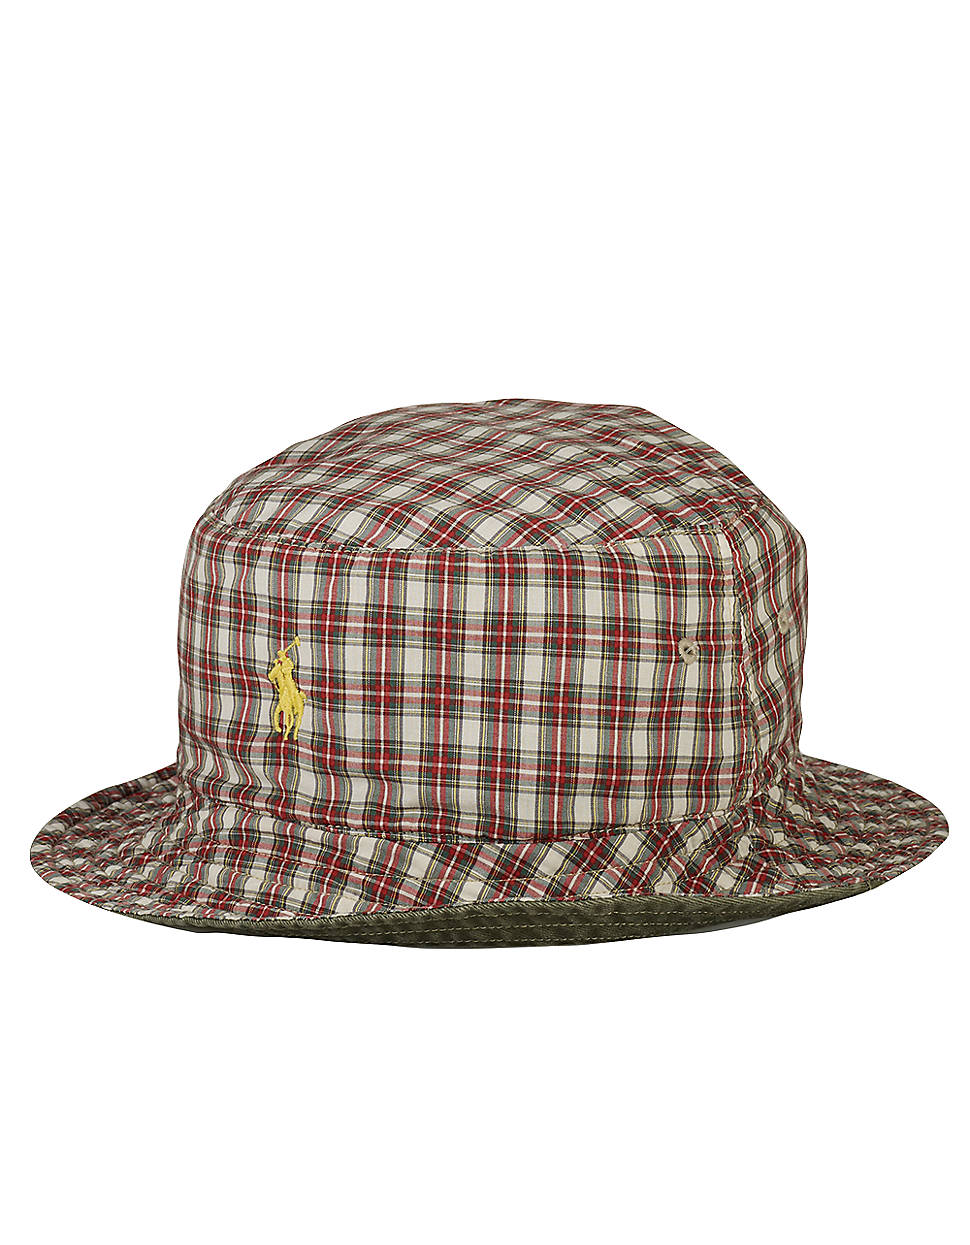 2bf56e3fc37 Lyst - Polo Ralph Lauren Reversible Beachside Bucket Hat in Red for Men